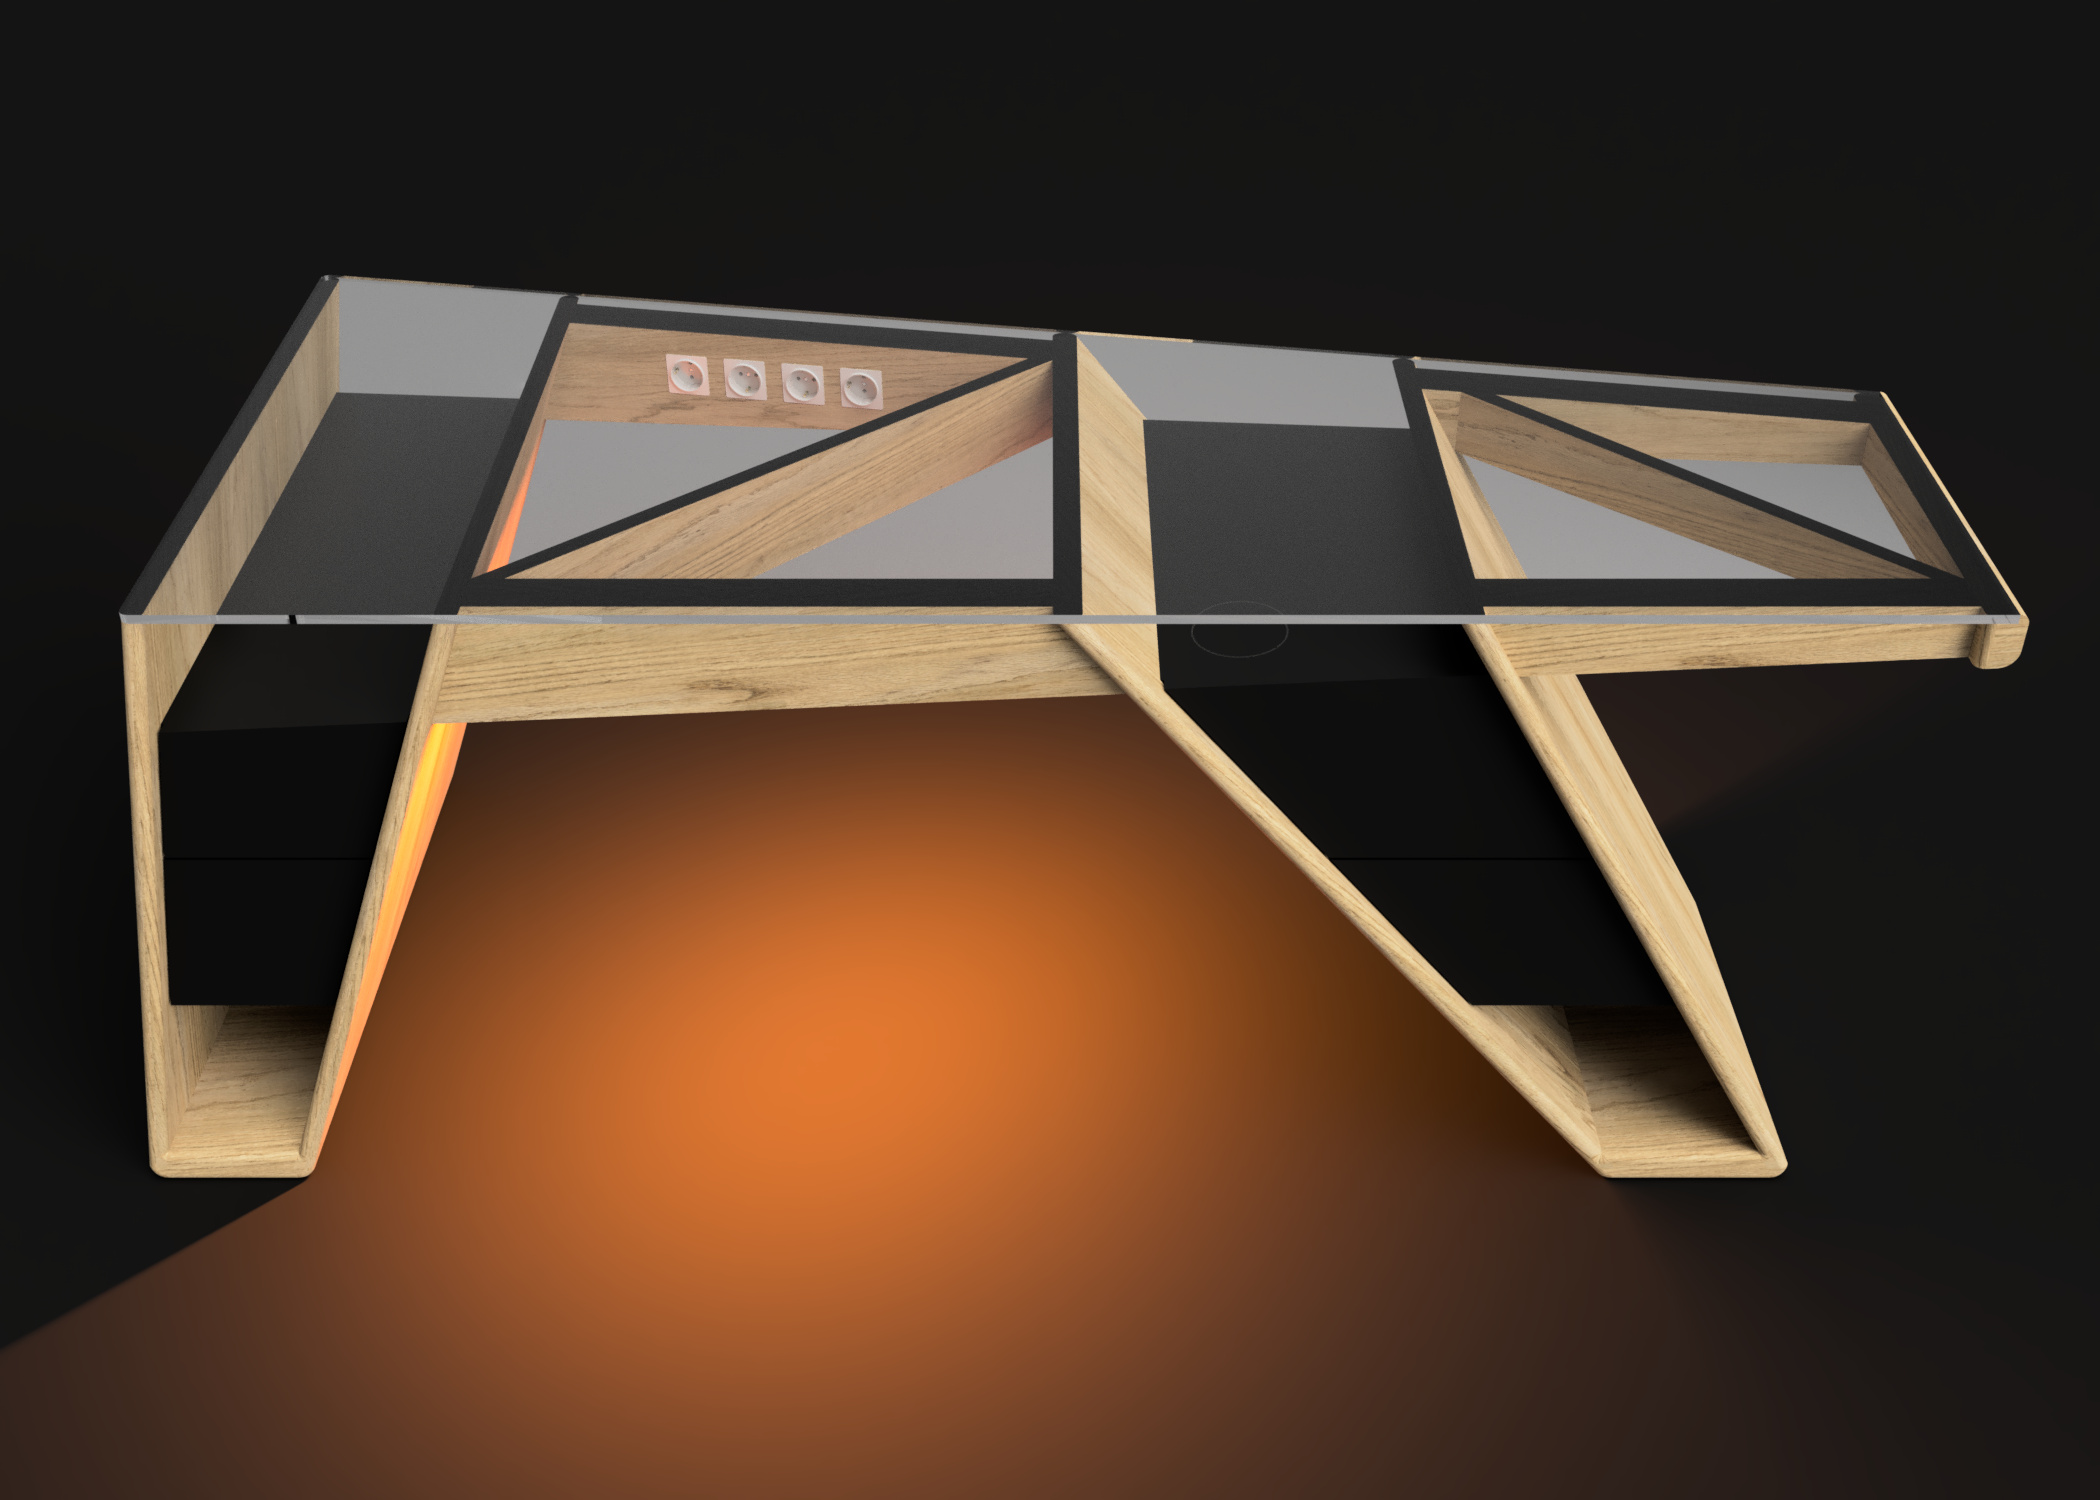 Mesa modelo Klemm luz naranja